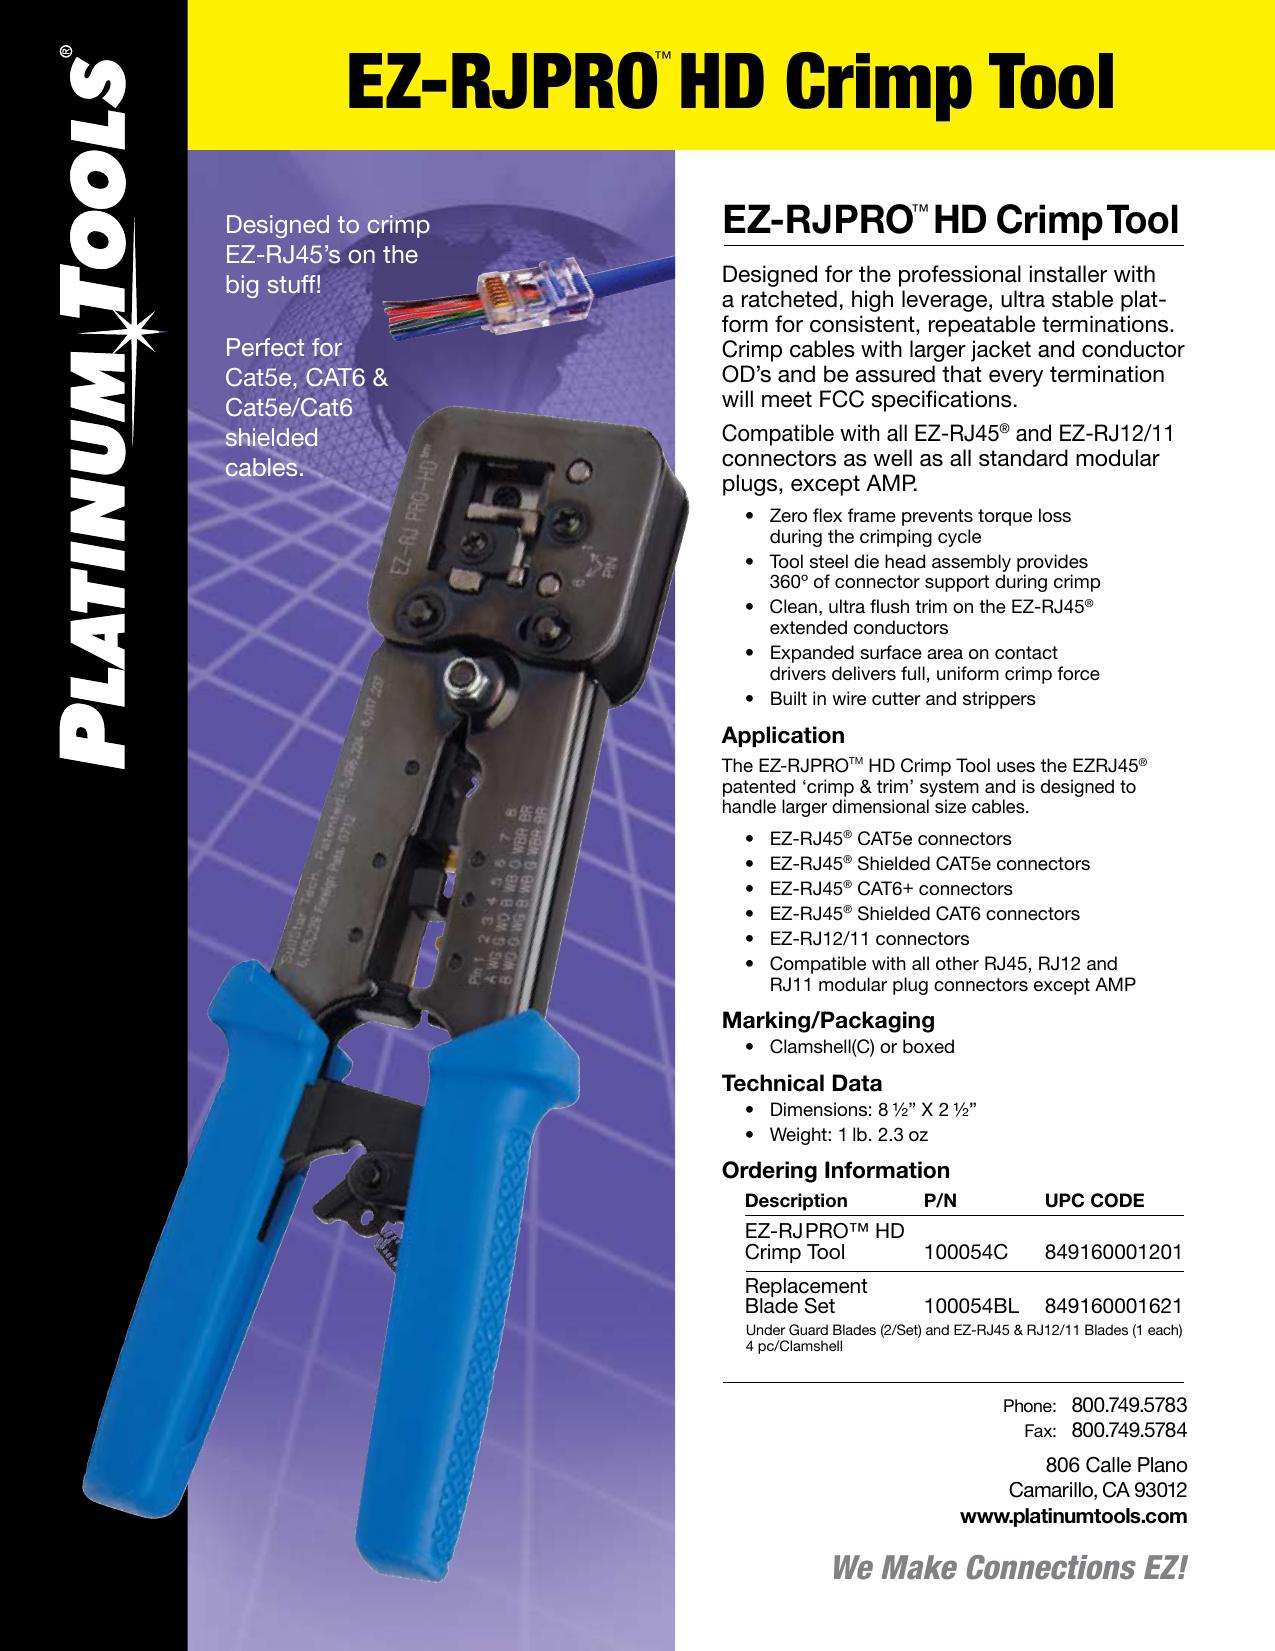 Combo Platinum Tools 100011C EZ-RJ45 Cat 6 Includes 30 Connectors and 30 Strain Reliefs